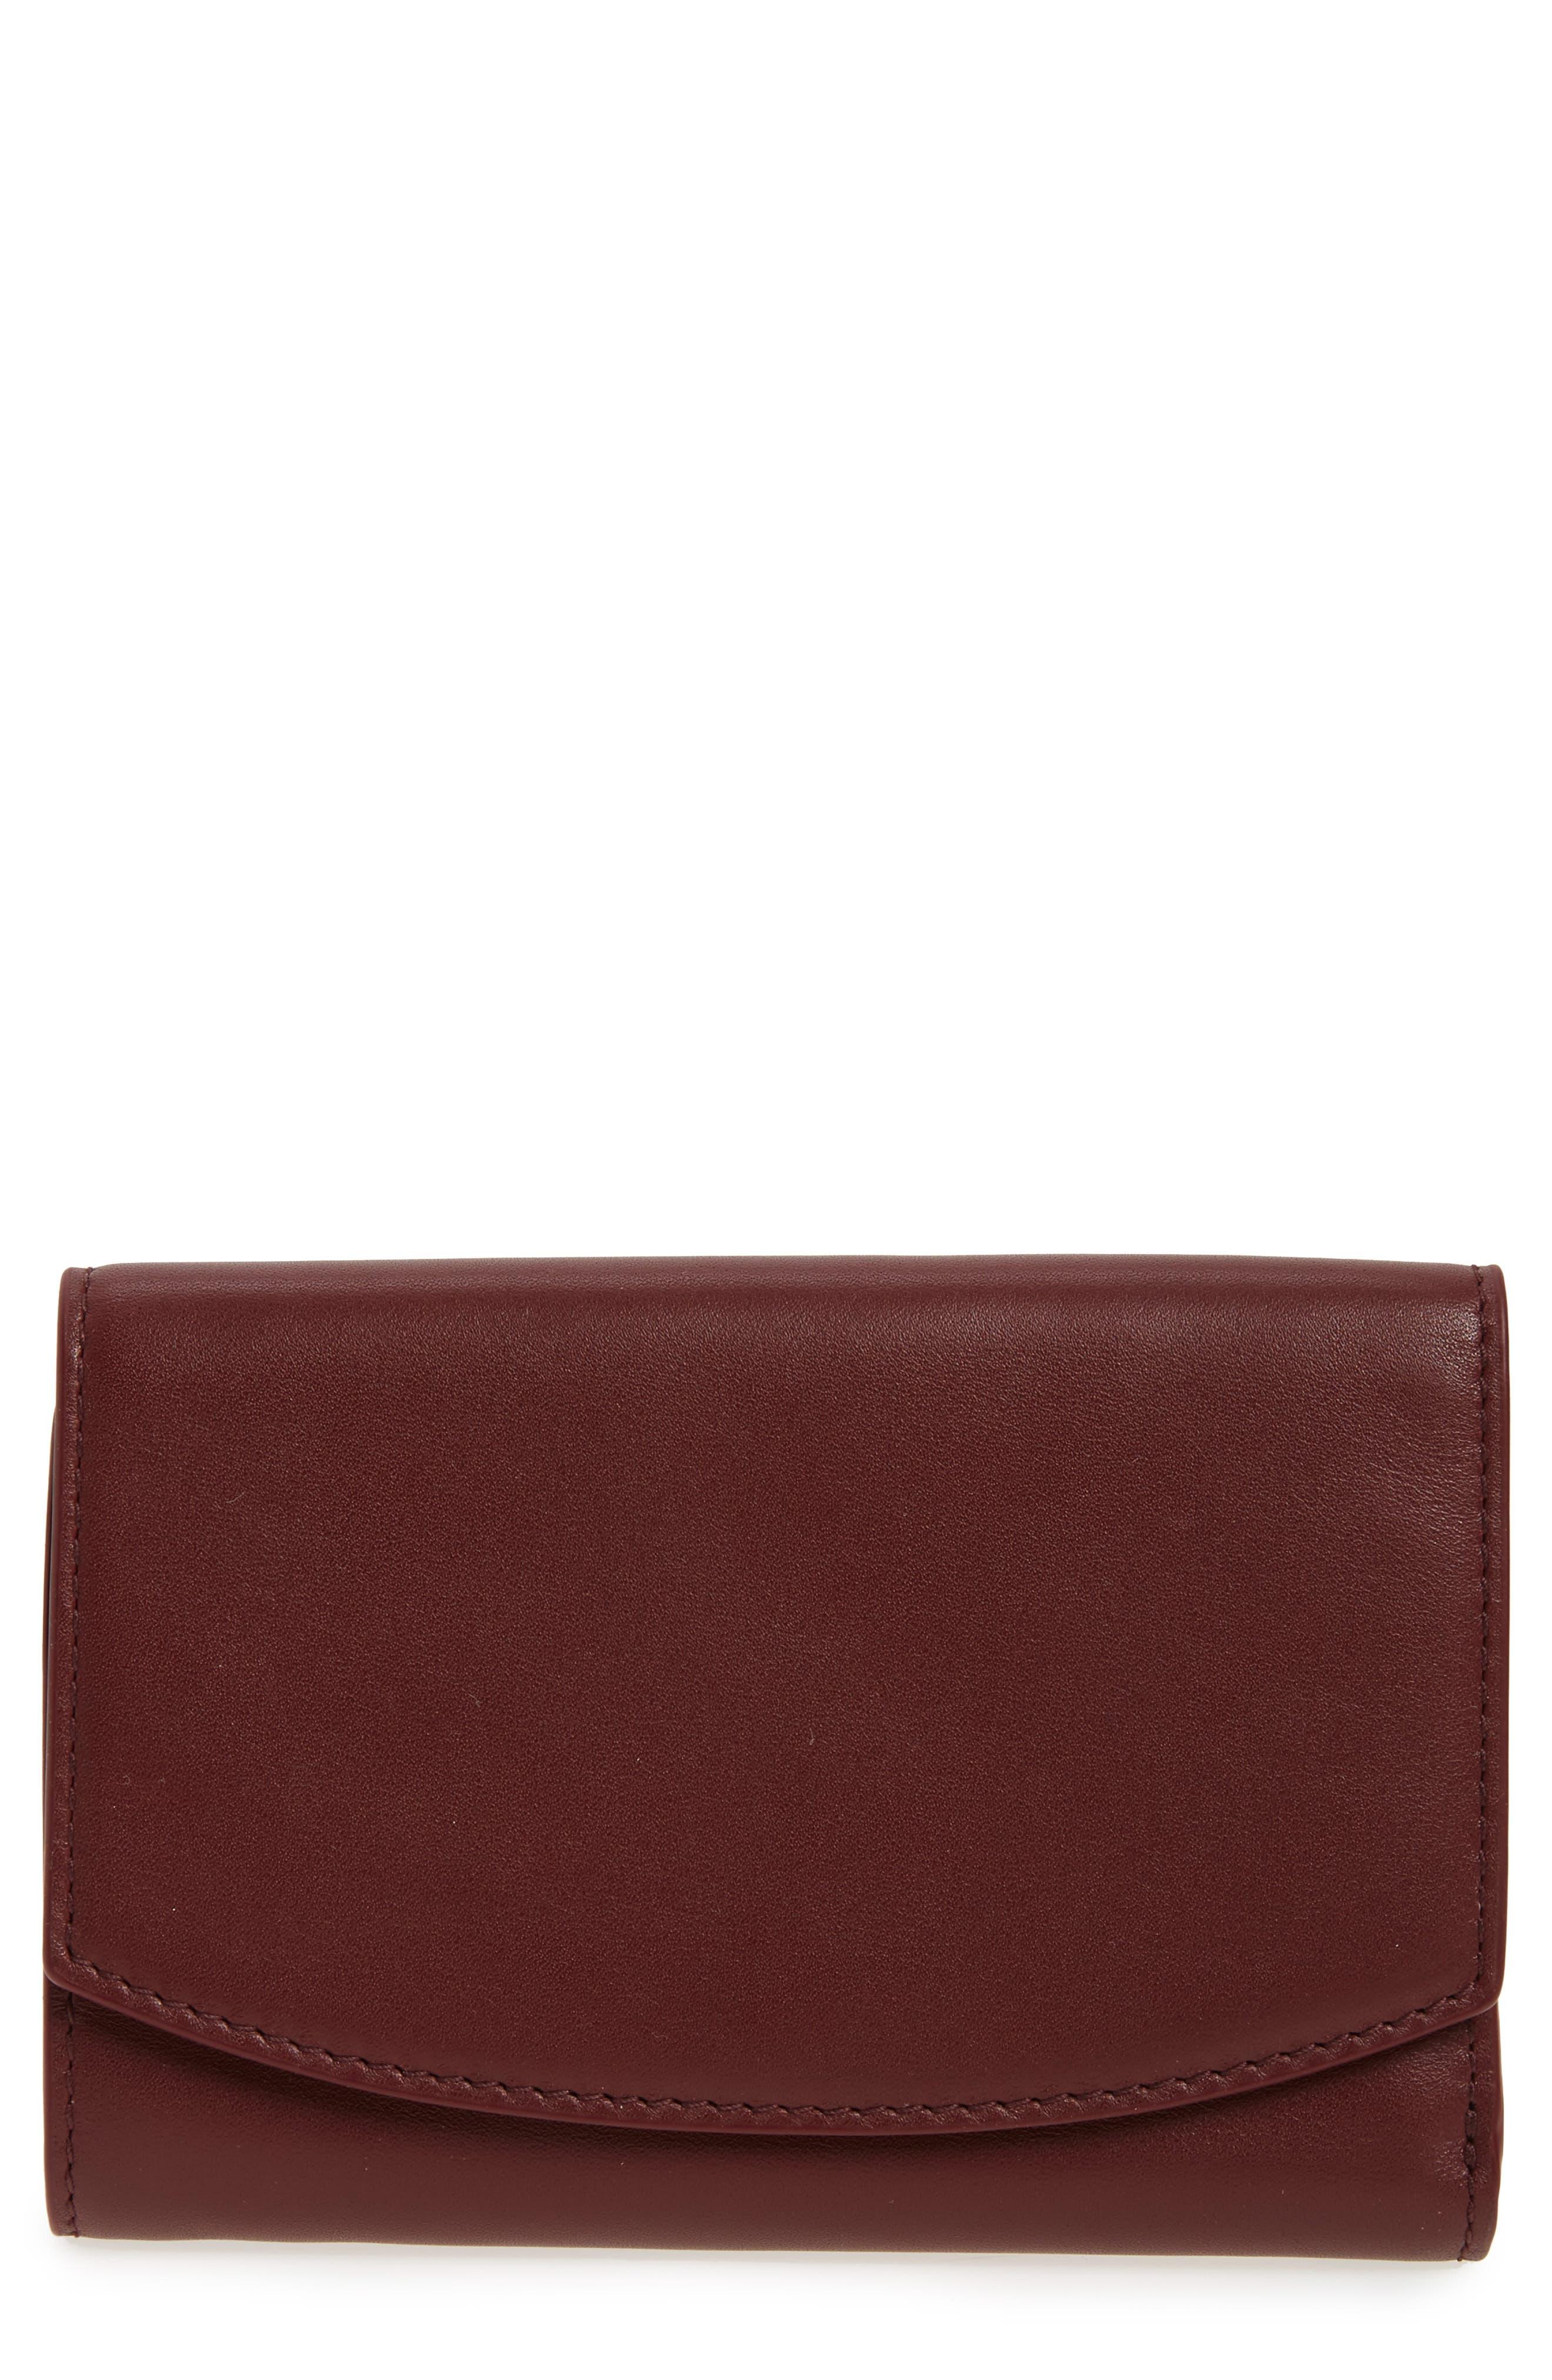 Compact Flap Leather Wallet,                             Main thumbnail 1, color,                             Cordovan